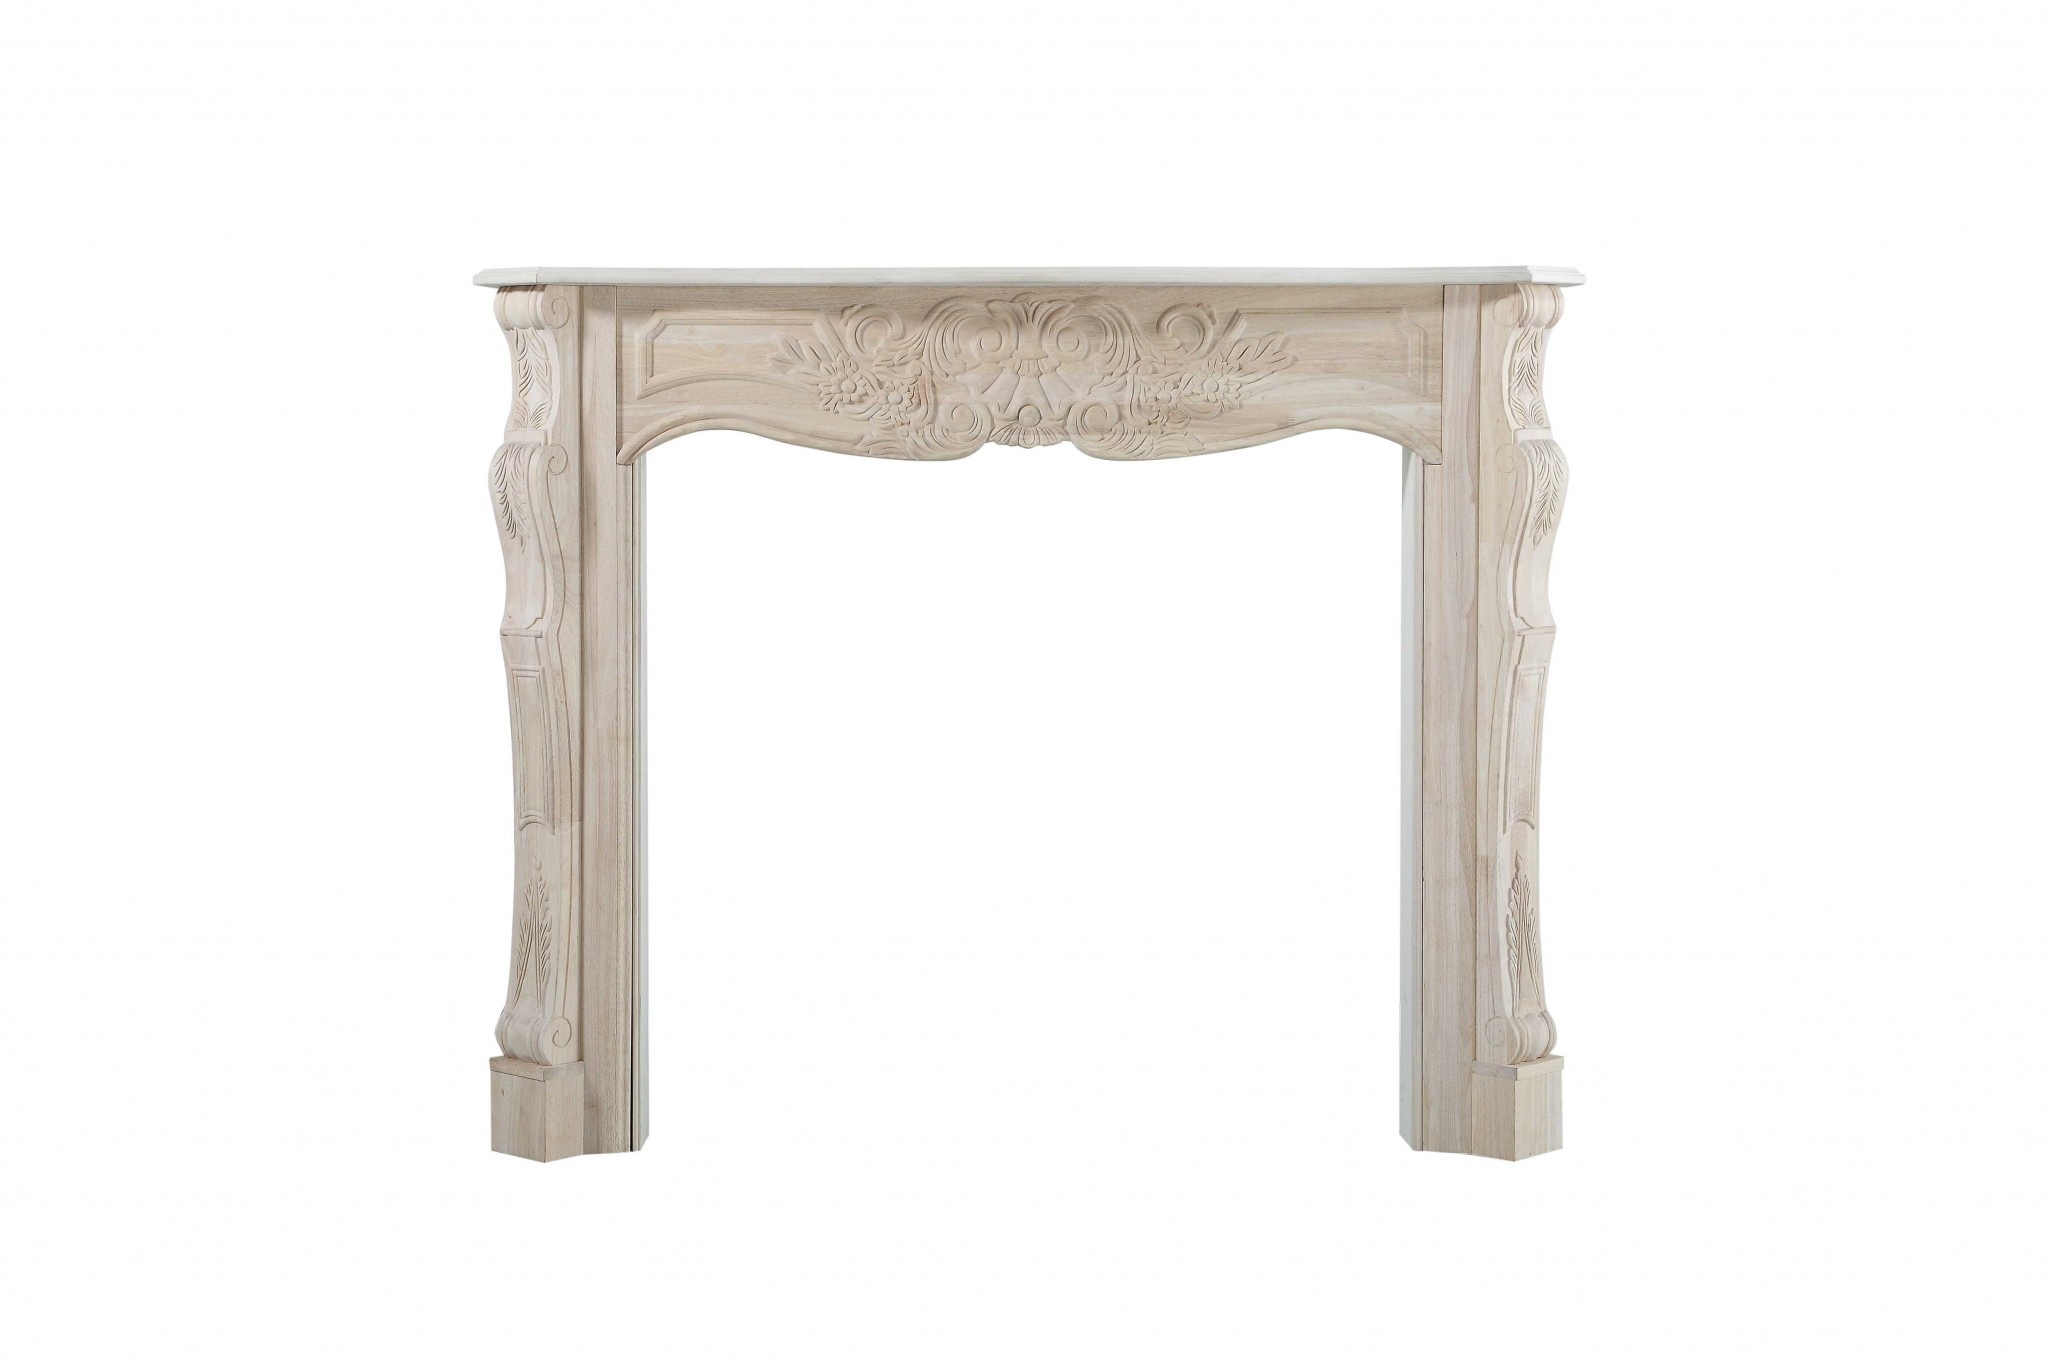 "77"" Contemporary Unfinished Wood Mantel Shelf"